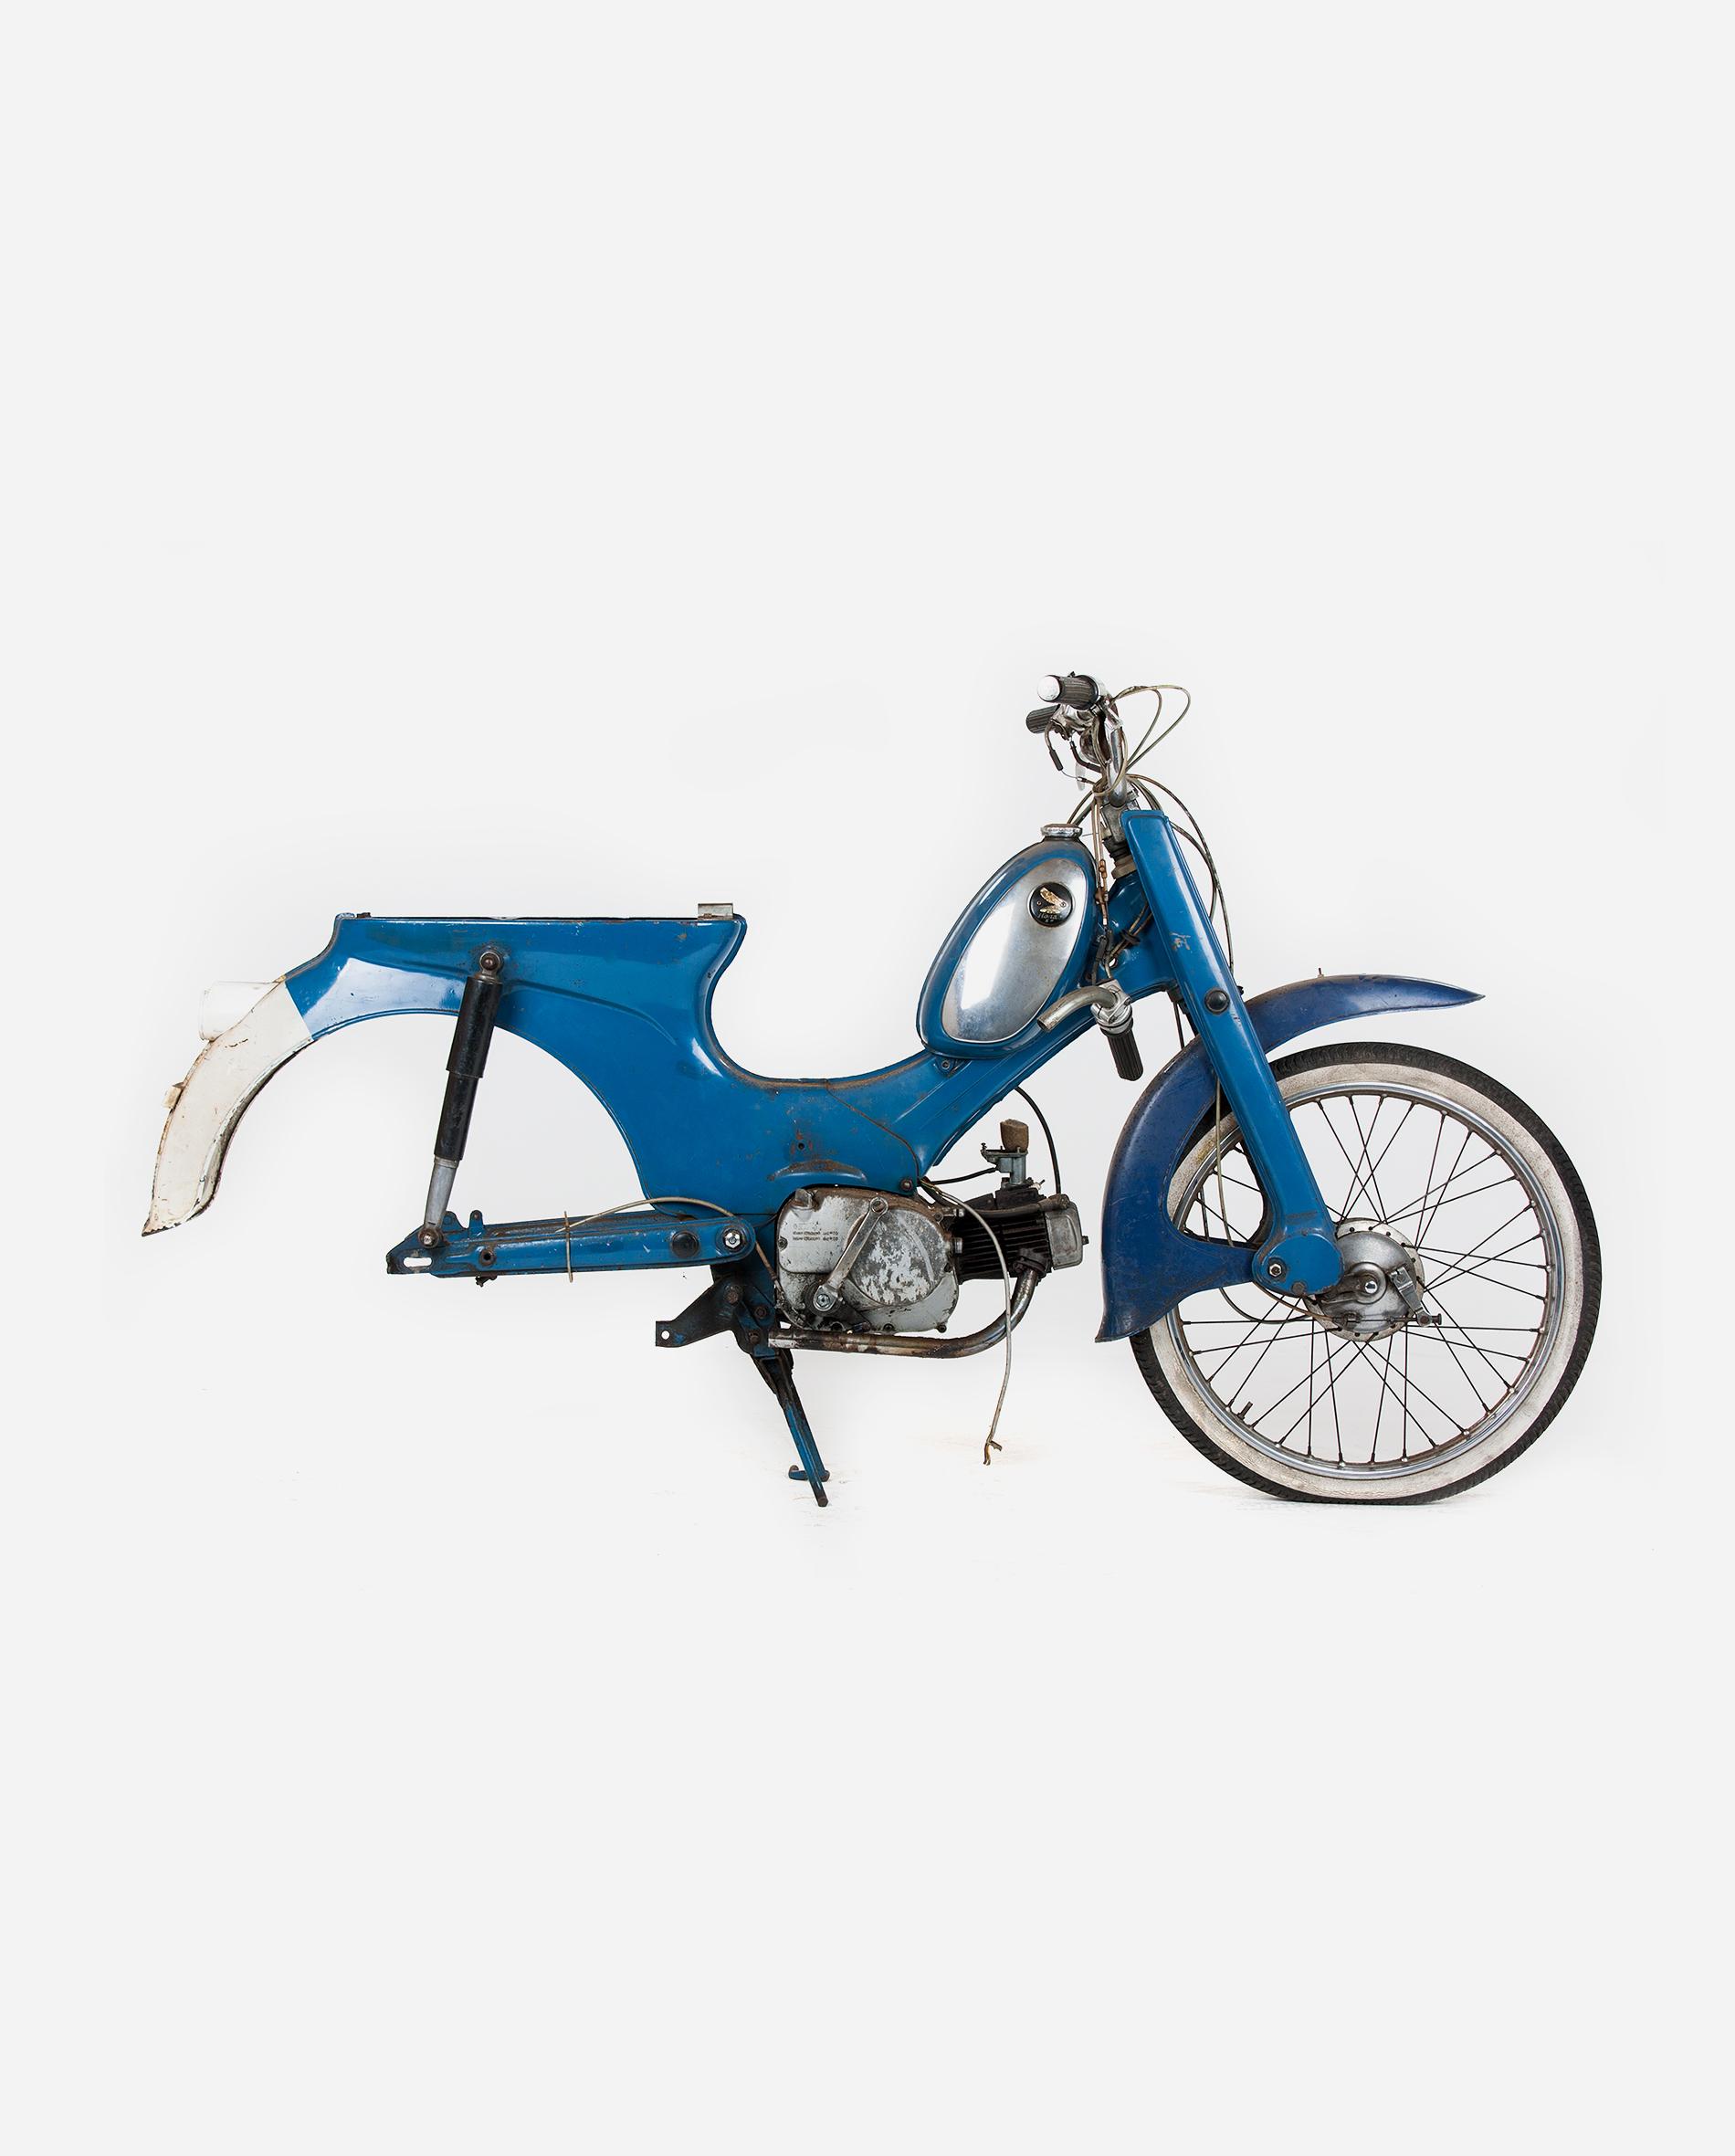 Beste Honda C310 parts or restoration · Fourstrokebarn XH-26